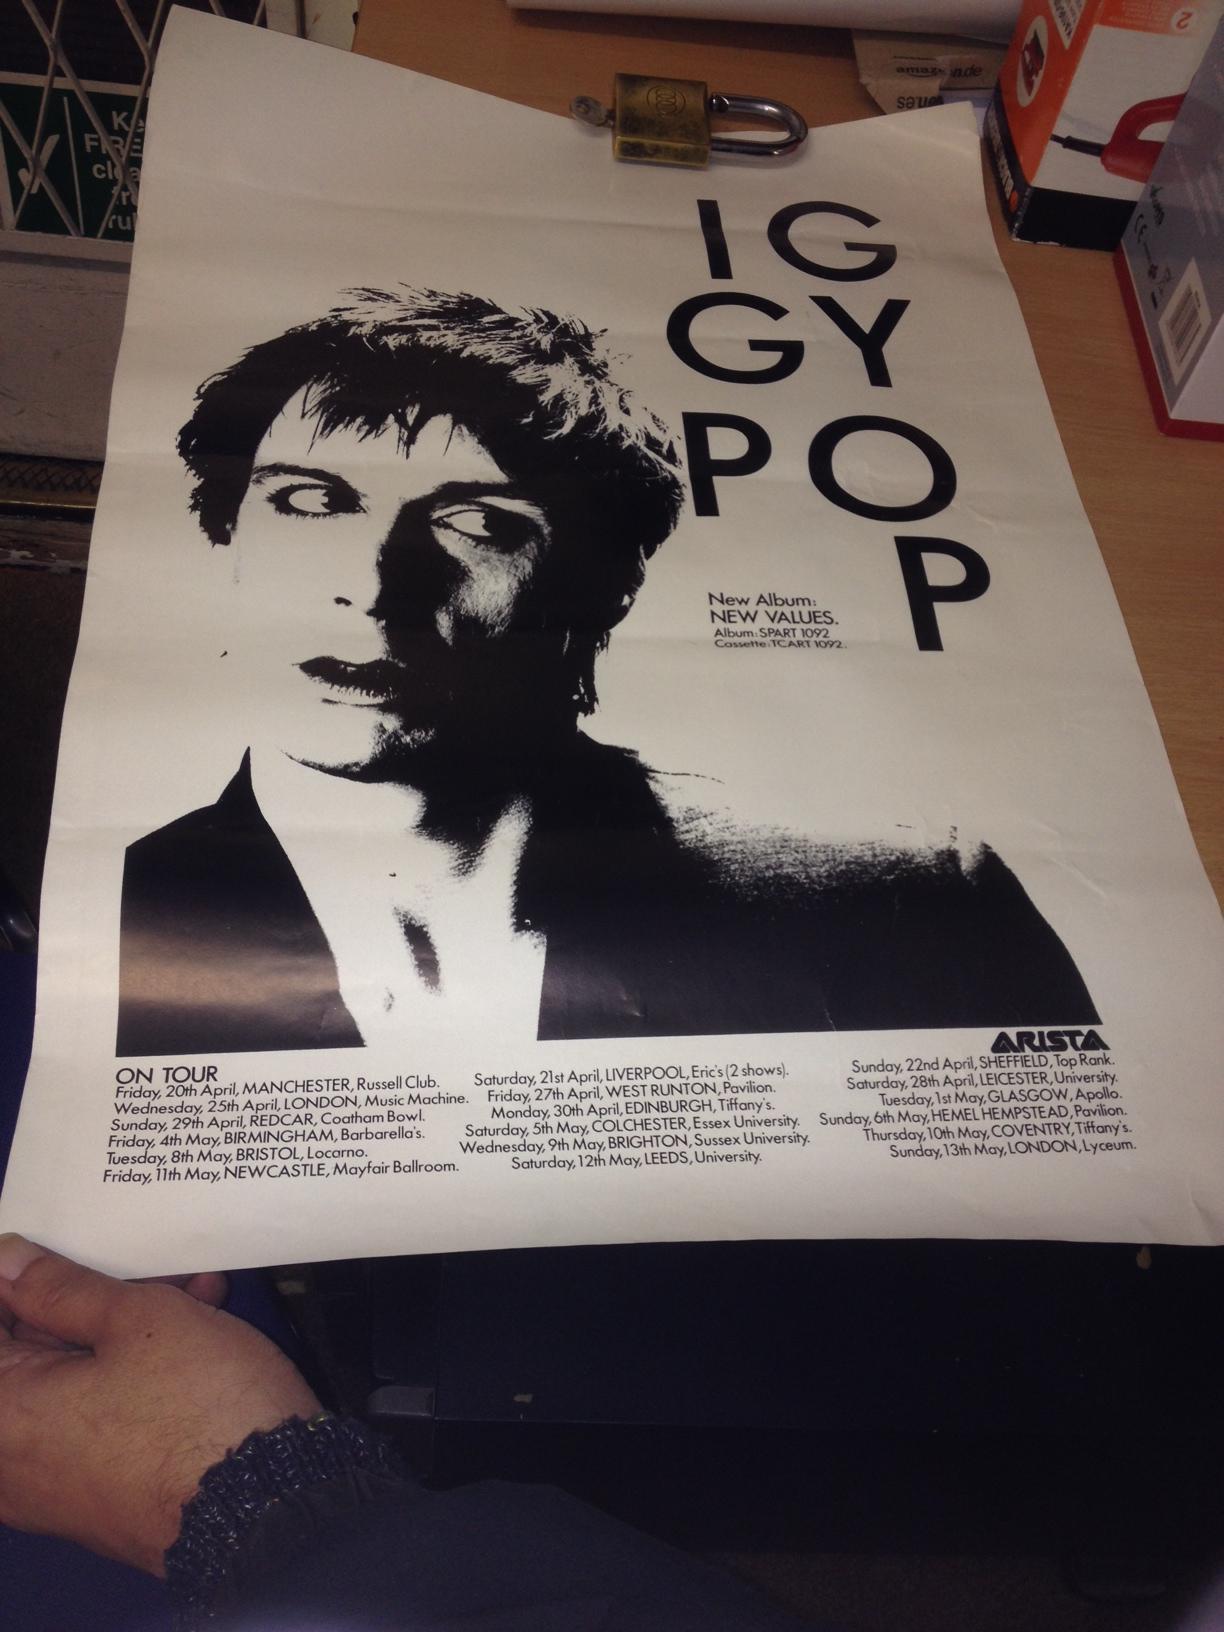 Iggy Pop New Values poster